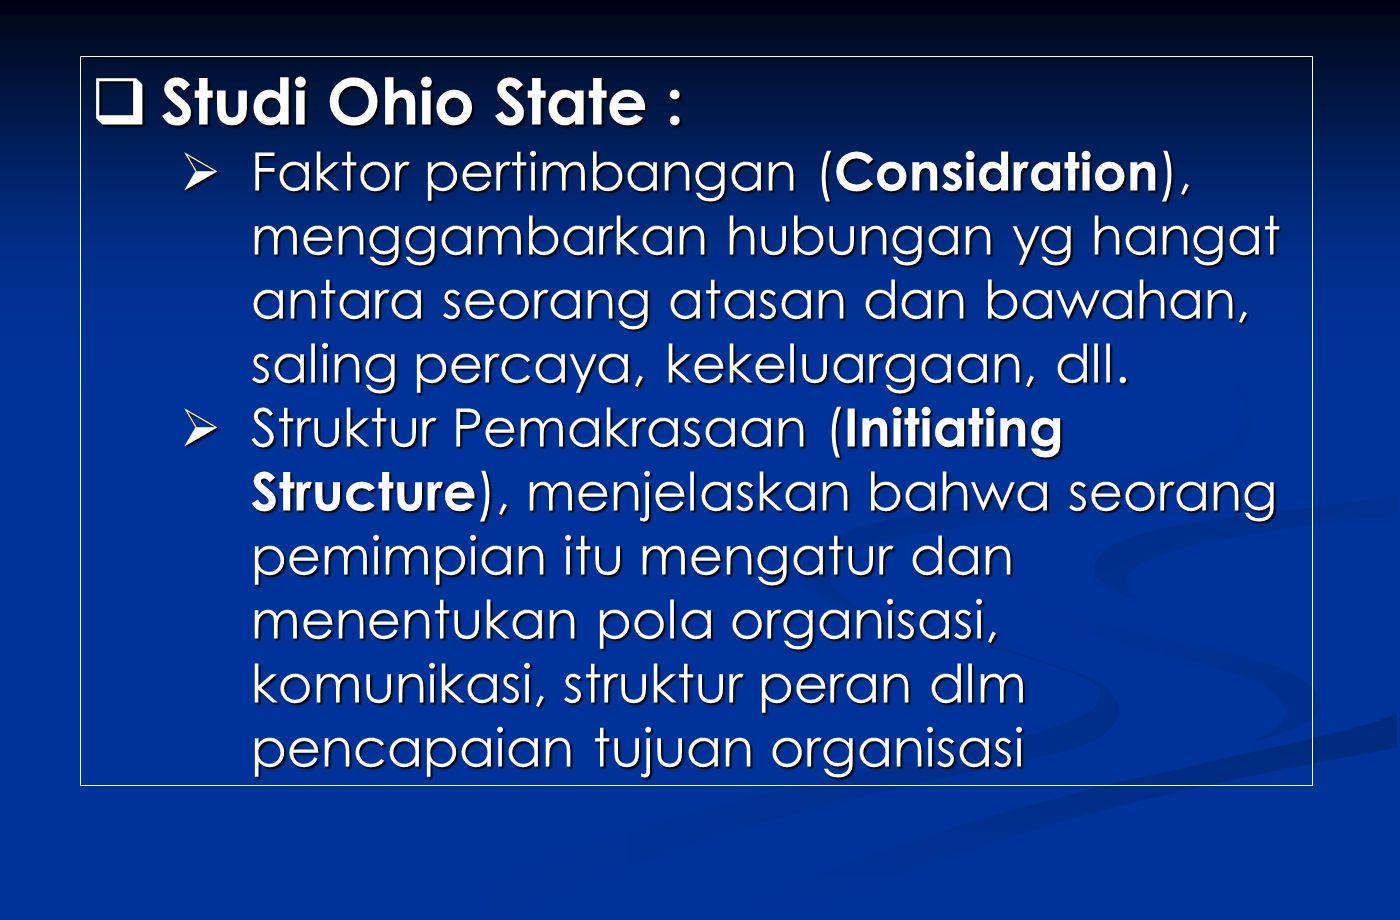  Studi Ohio State :  Faktor pertimbangan ( Considration ), menggambarkan hubungan yg hangat antara seorang atasan dan bawahan, saling percaya, kekeluargaan, dll.